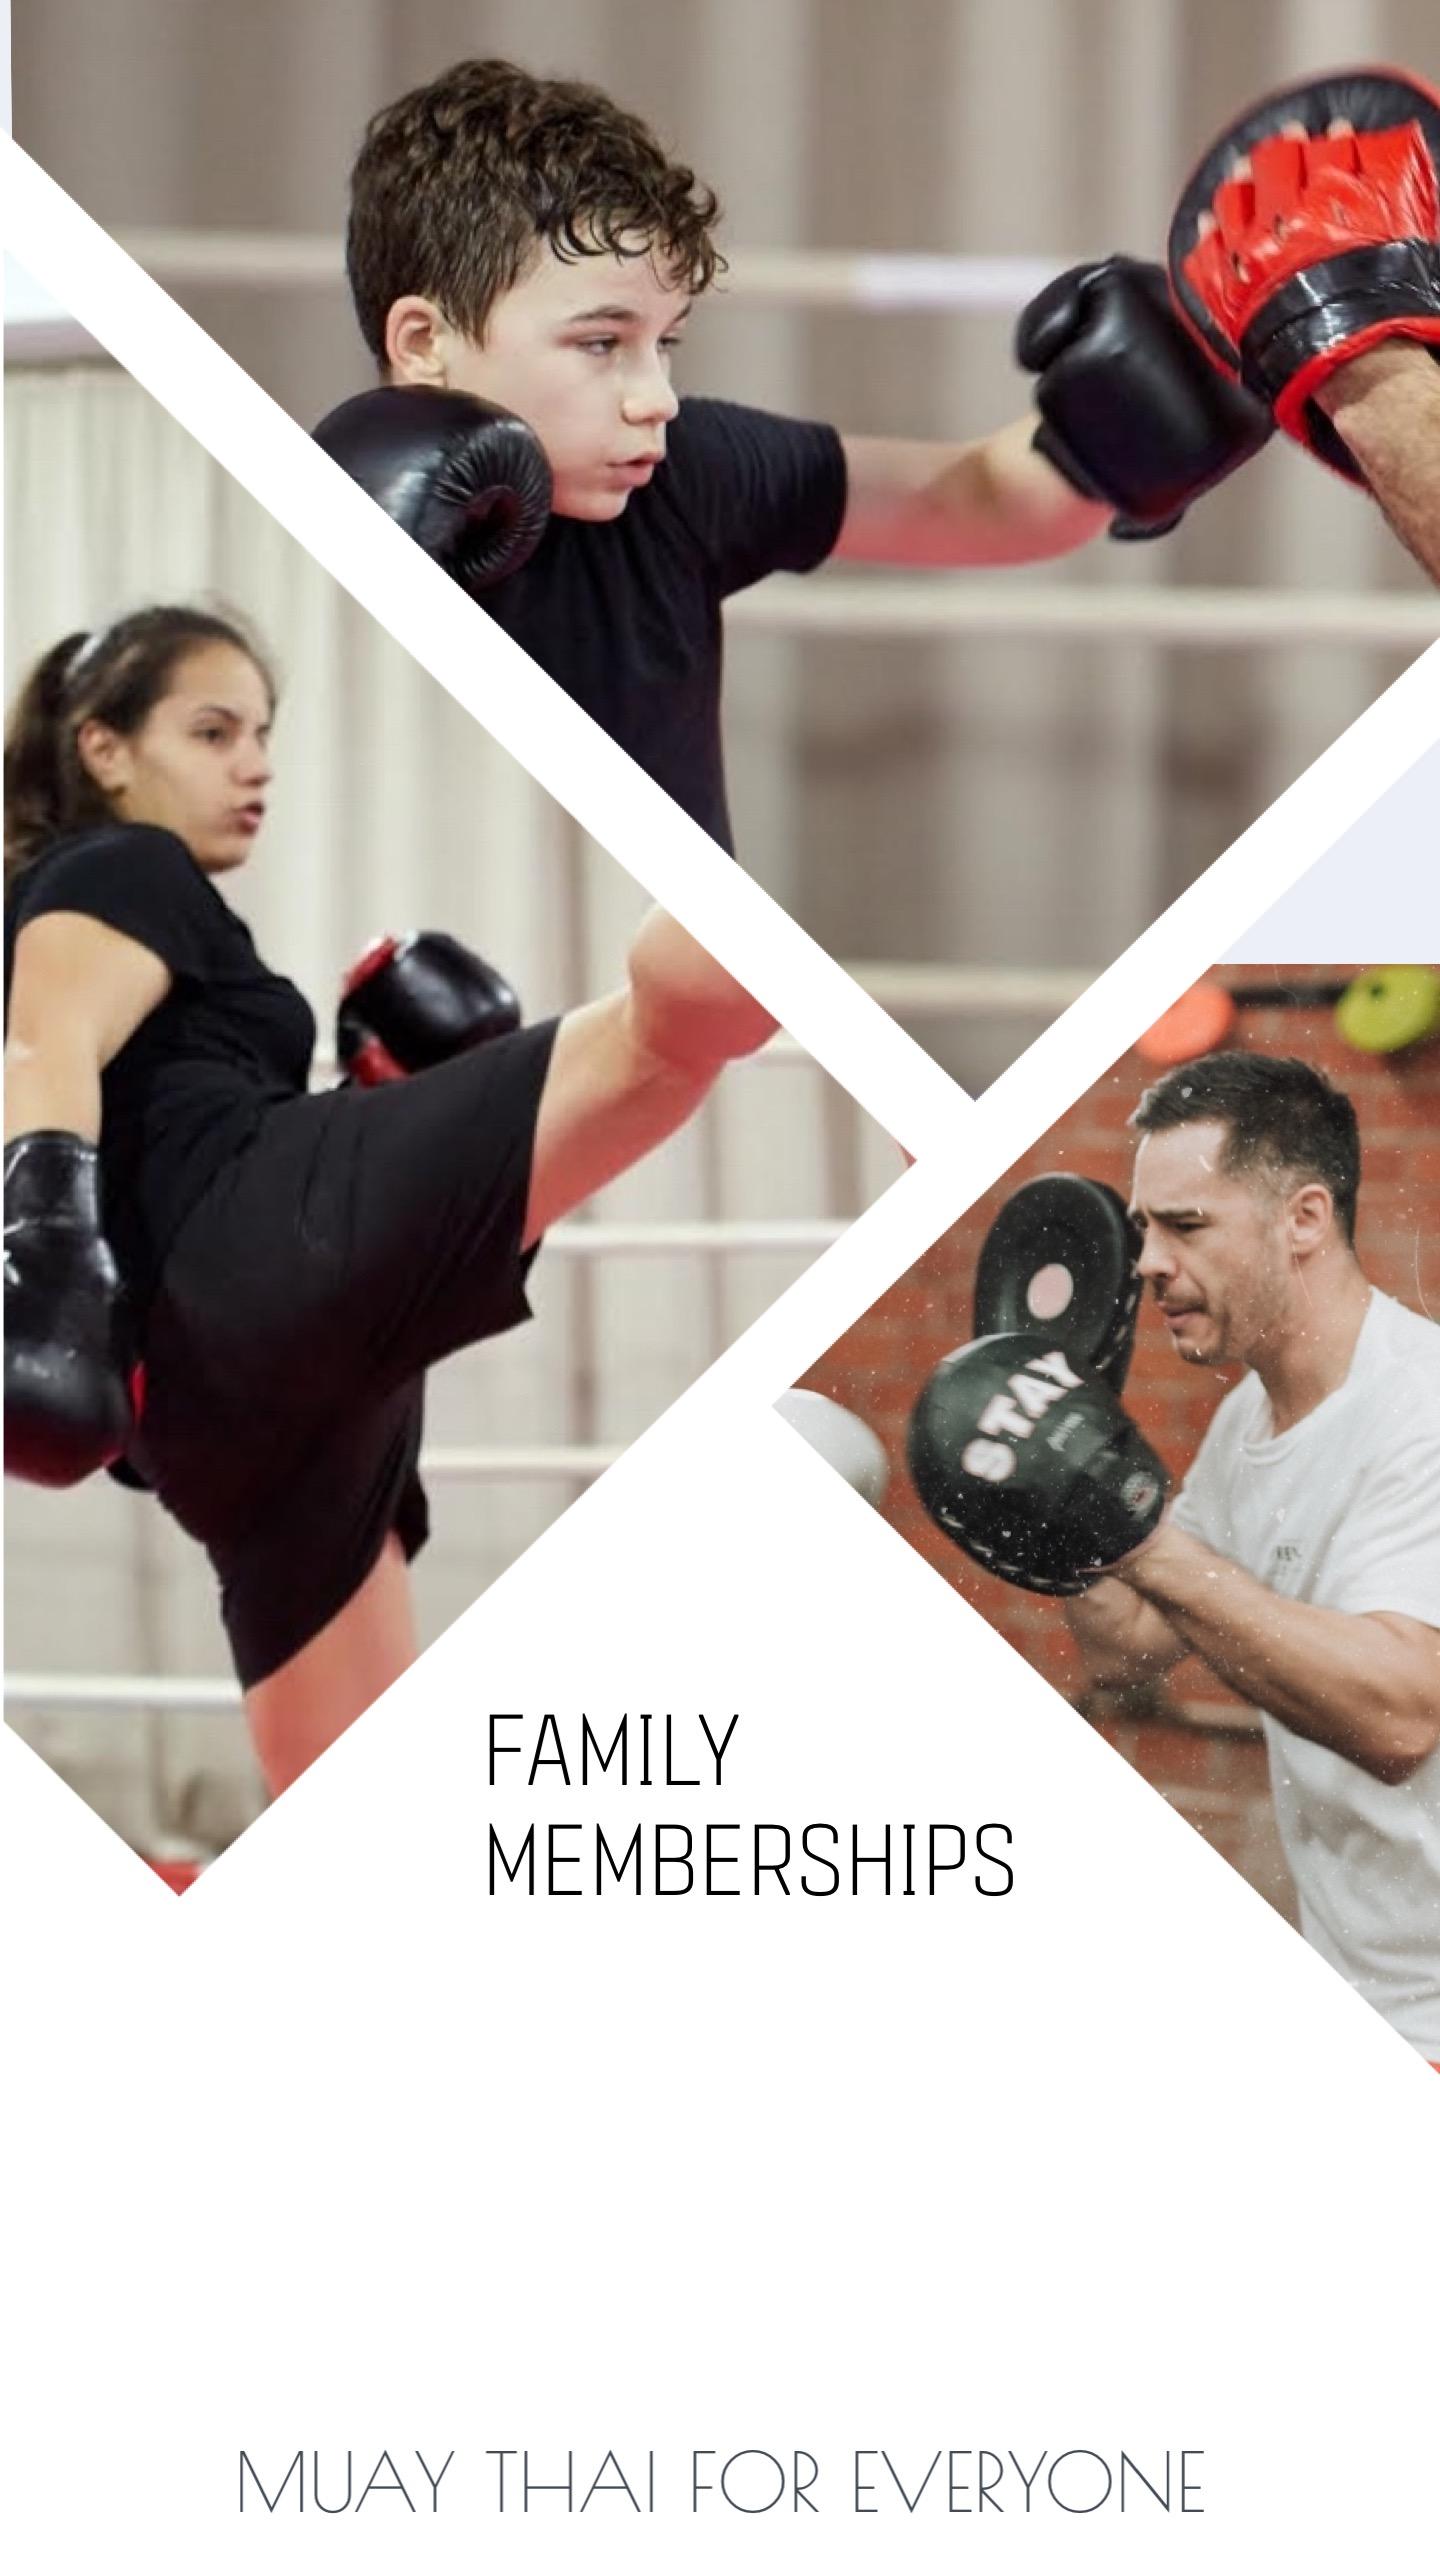 Family Memberships